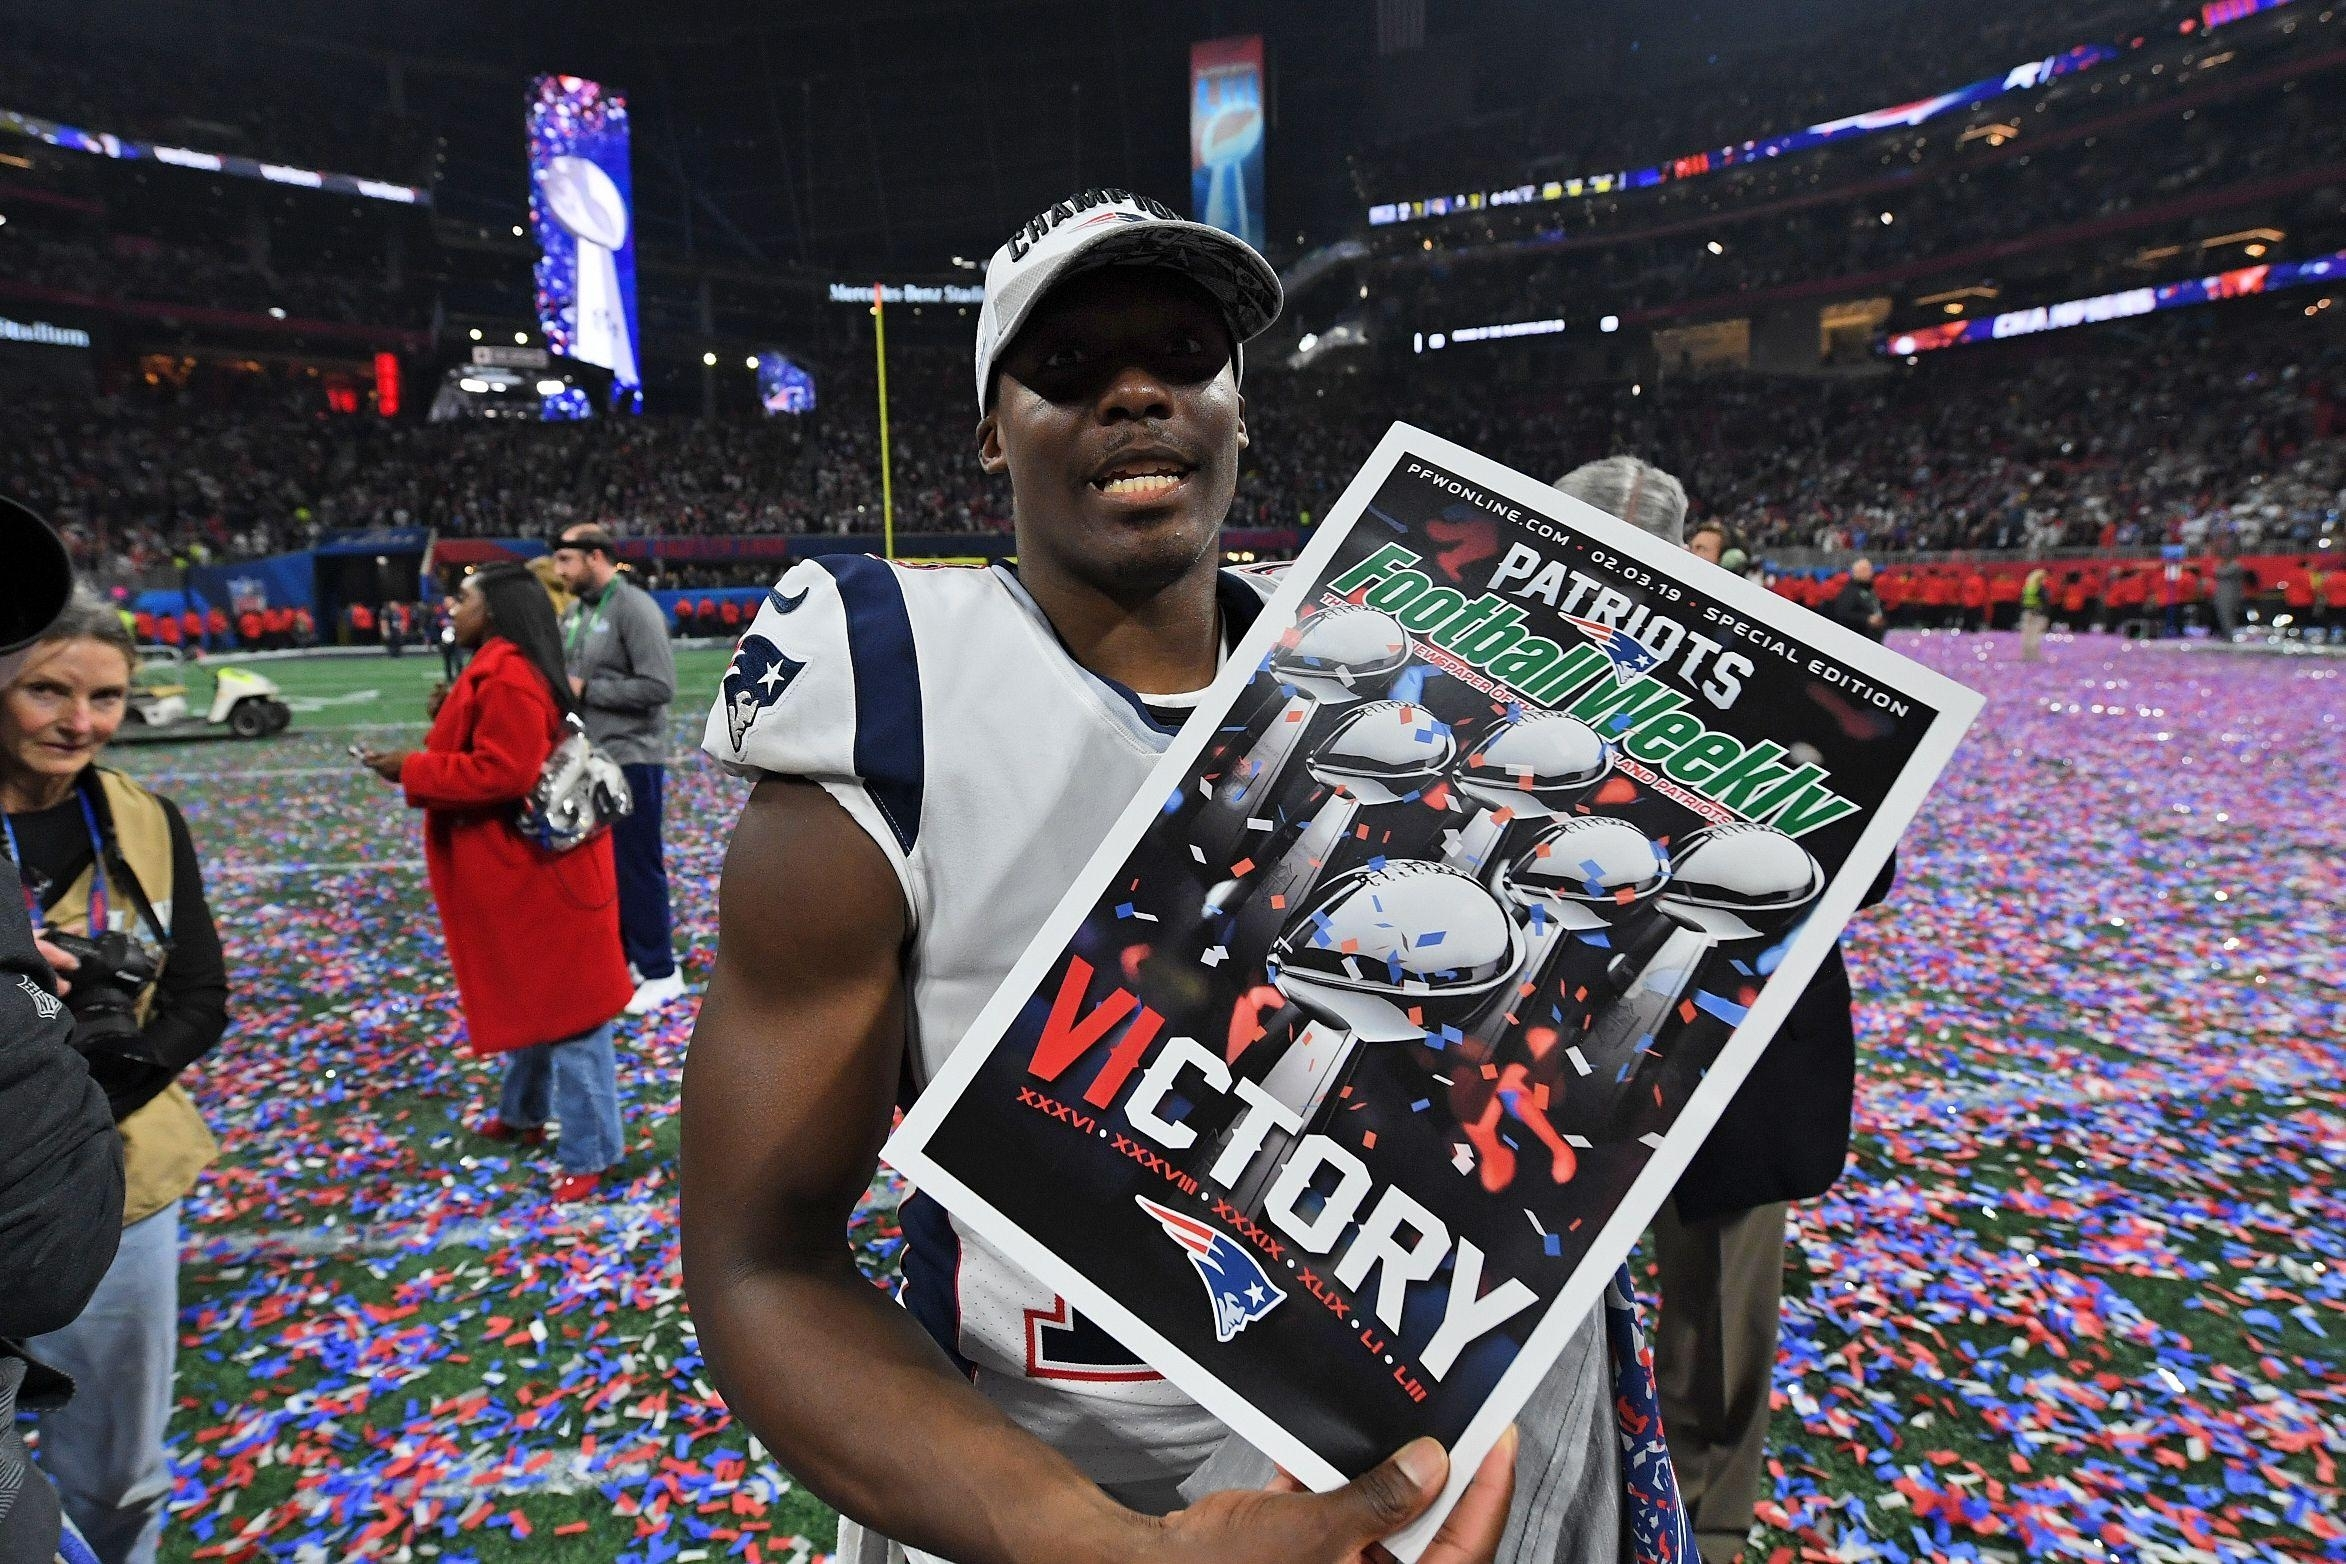 Super Bowl 2019 Attendance: La Rams Vs New England Patriots with Super Bowl Attendance 2019